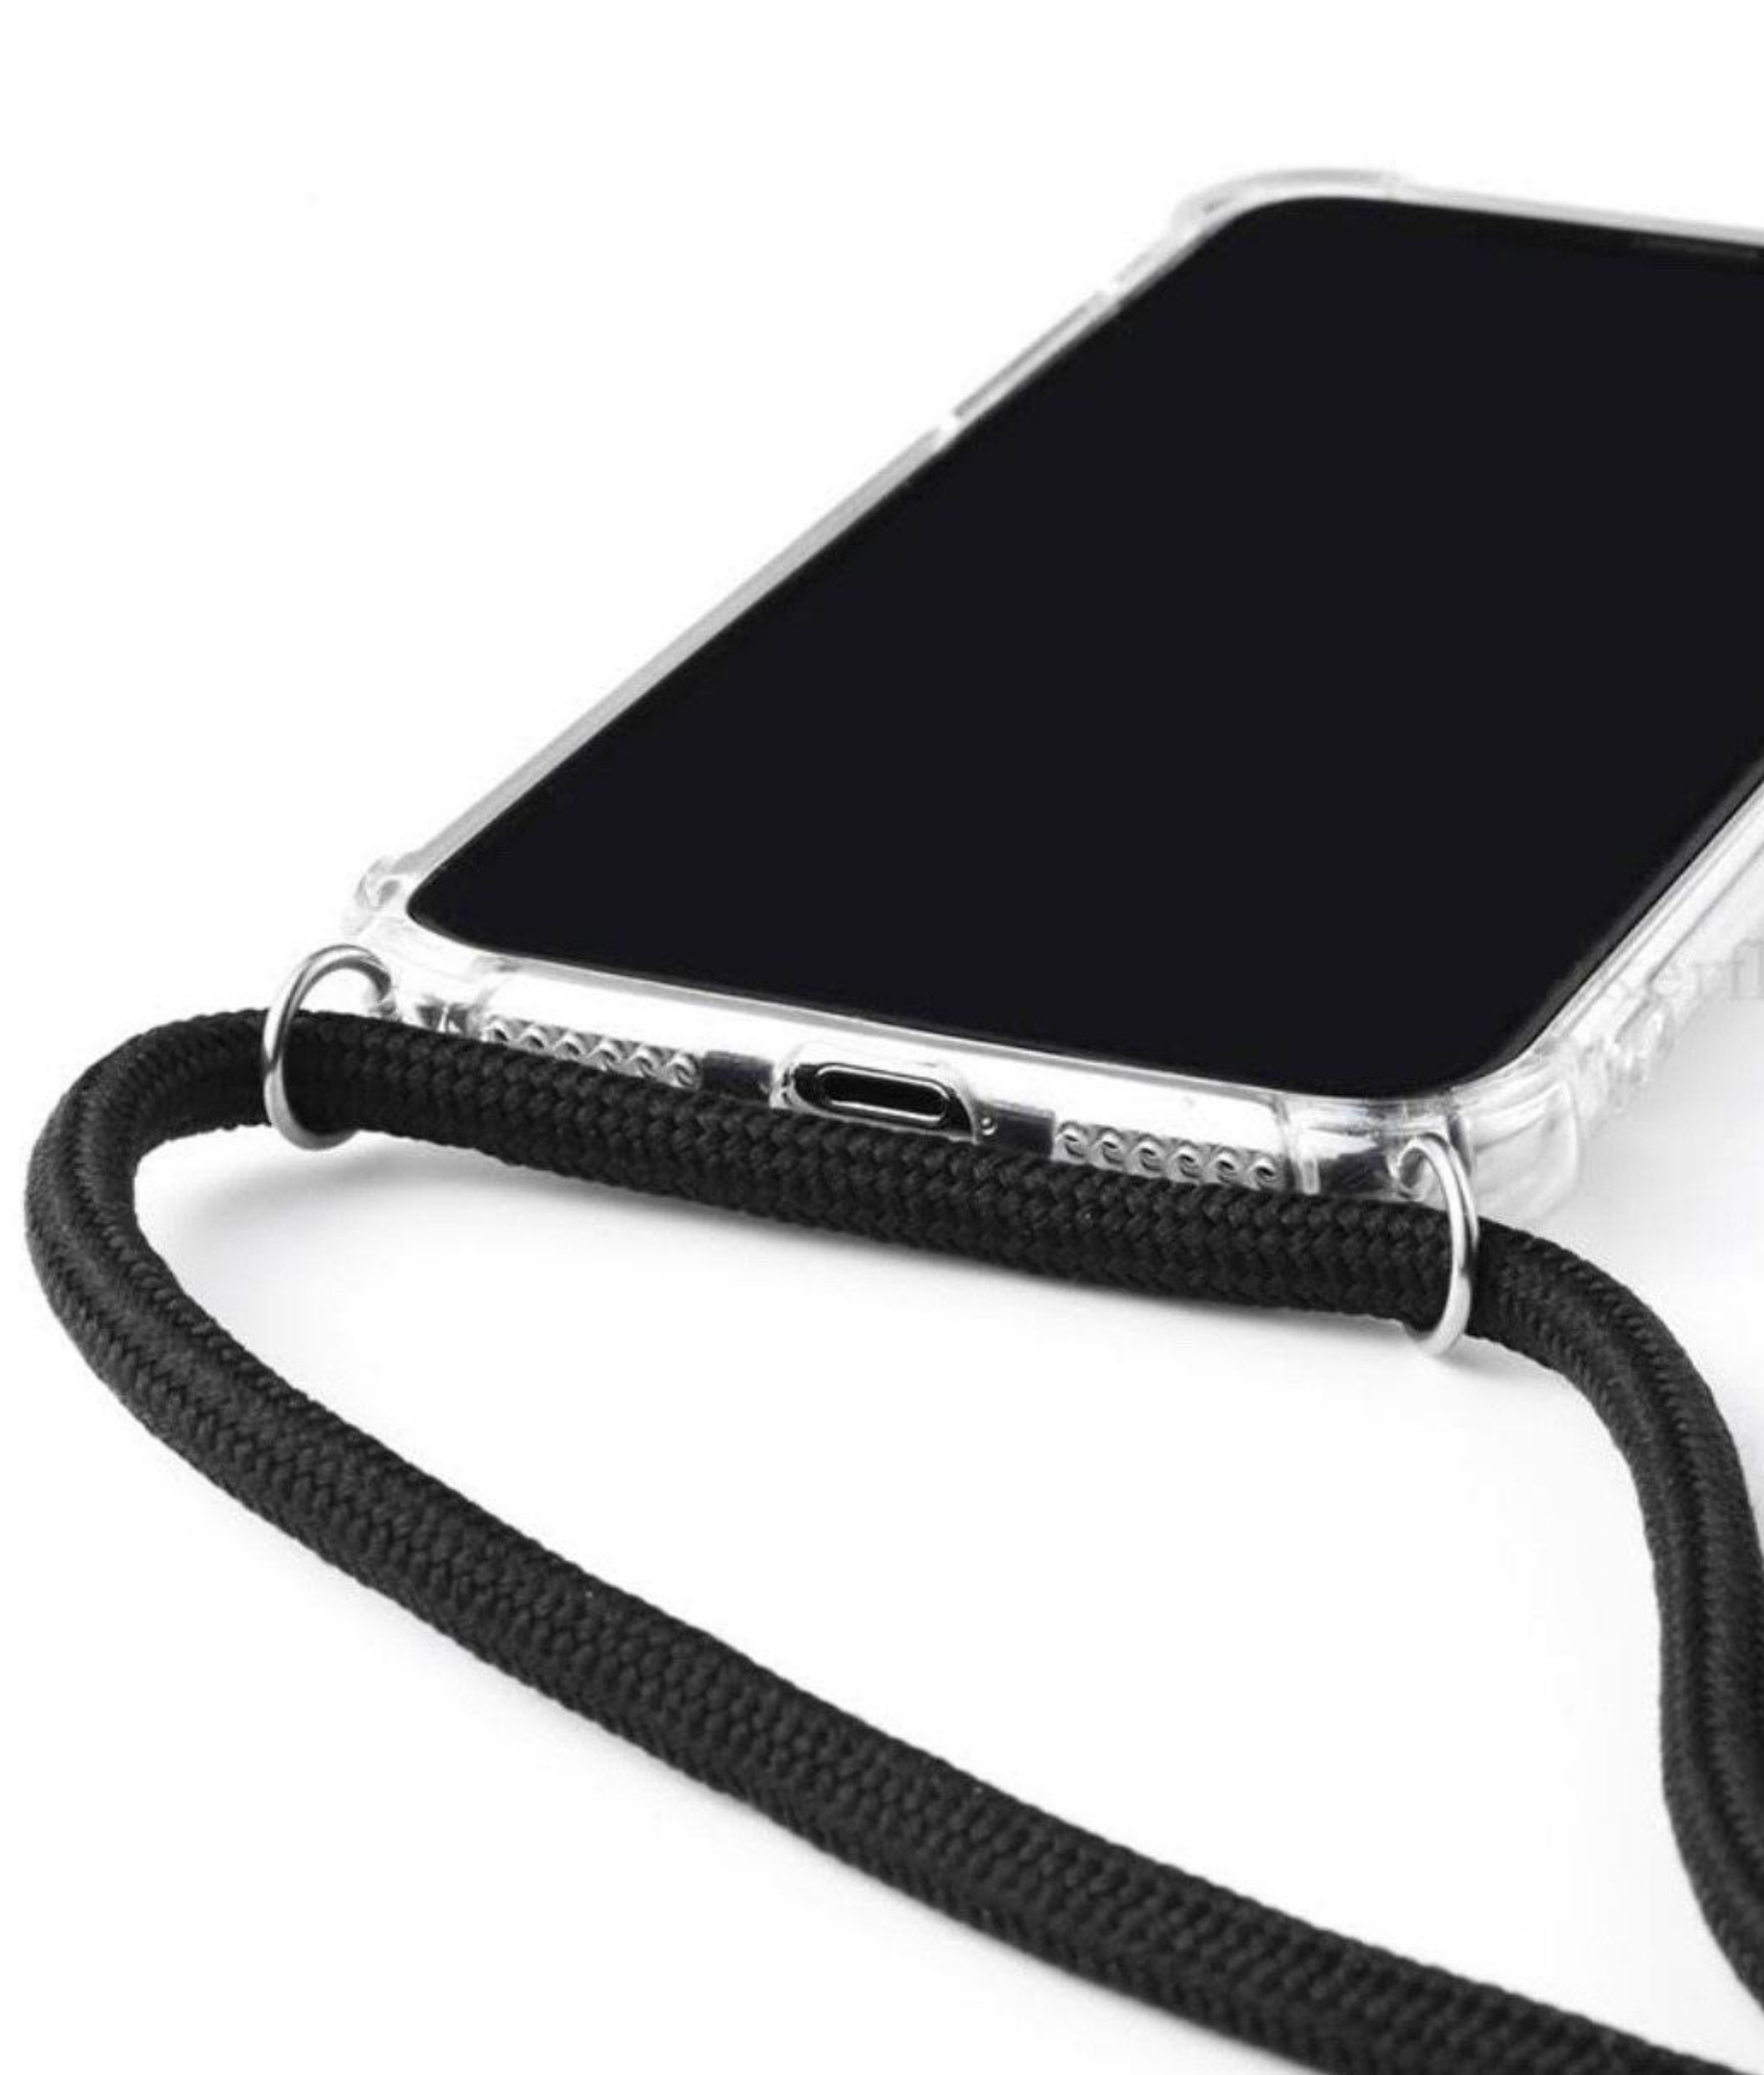 Cord Iphone 11 Case - Black